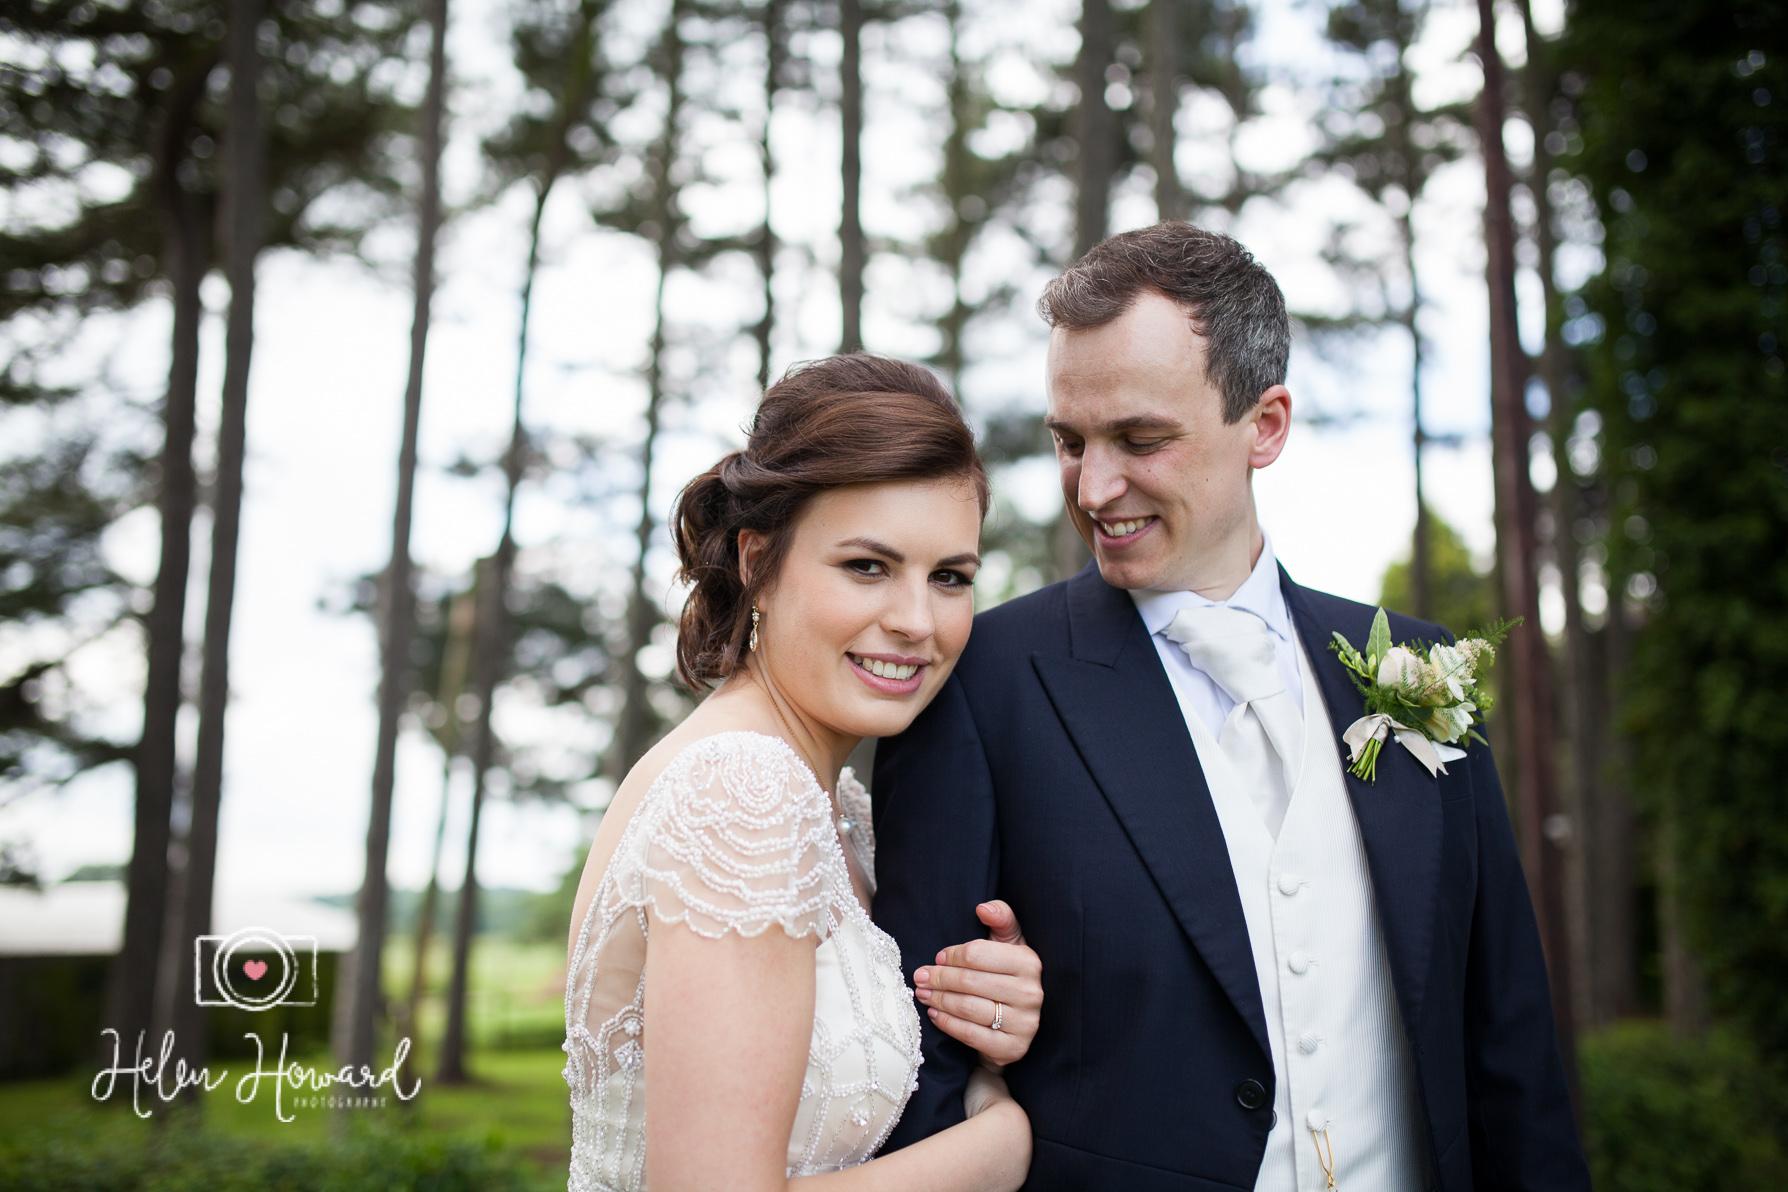 Helen Howard Photography Packington Moor Wedding-81.jpg